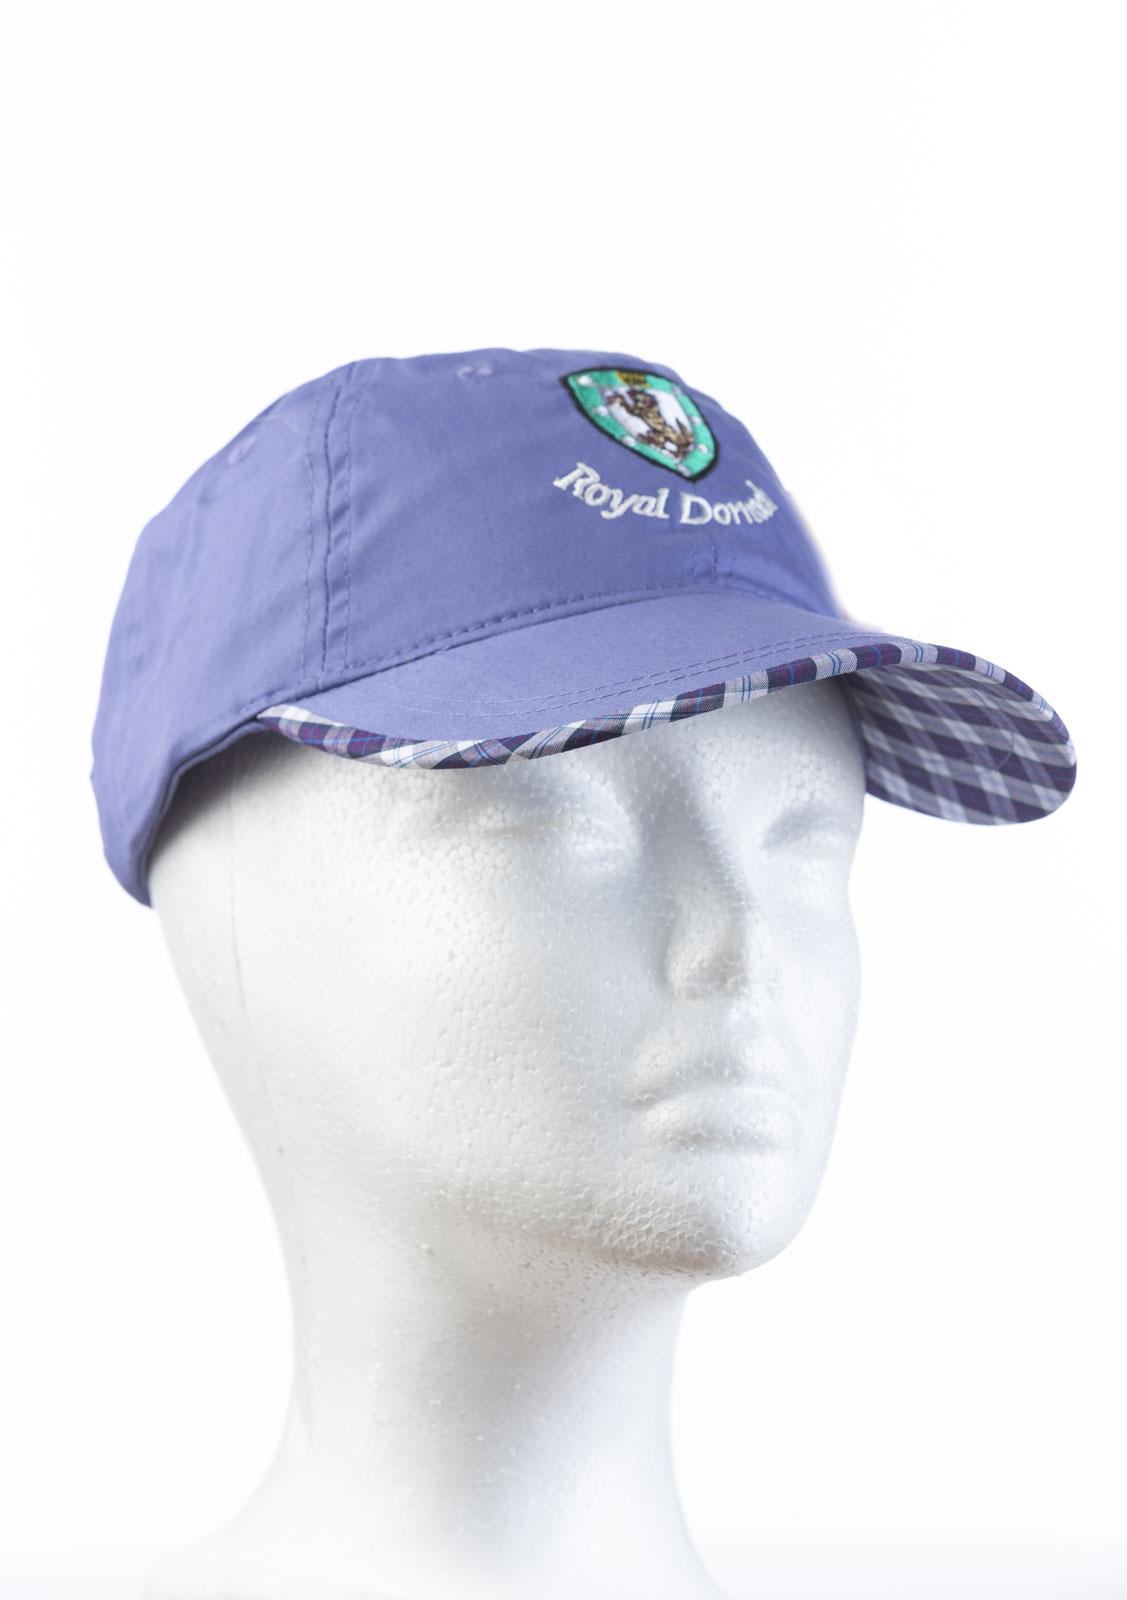 79f0f39c9a601 Ladies Roma Baseball Cap - Royal Dornoch Pro Shop